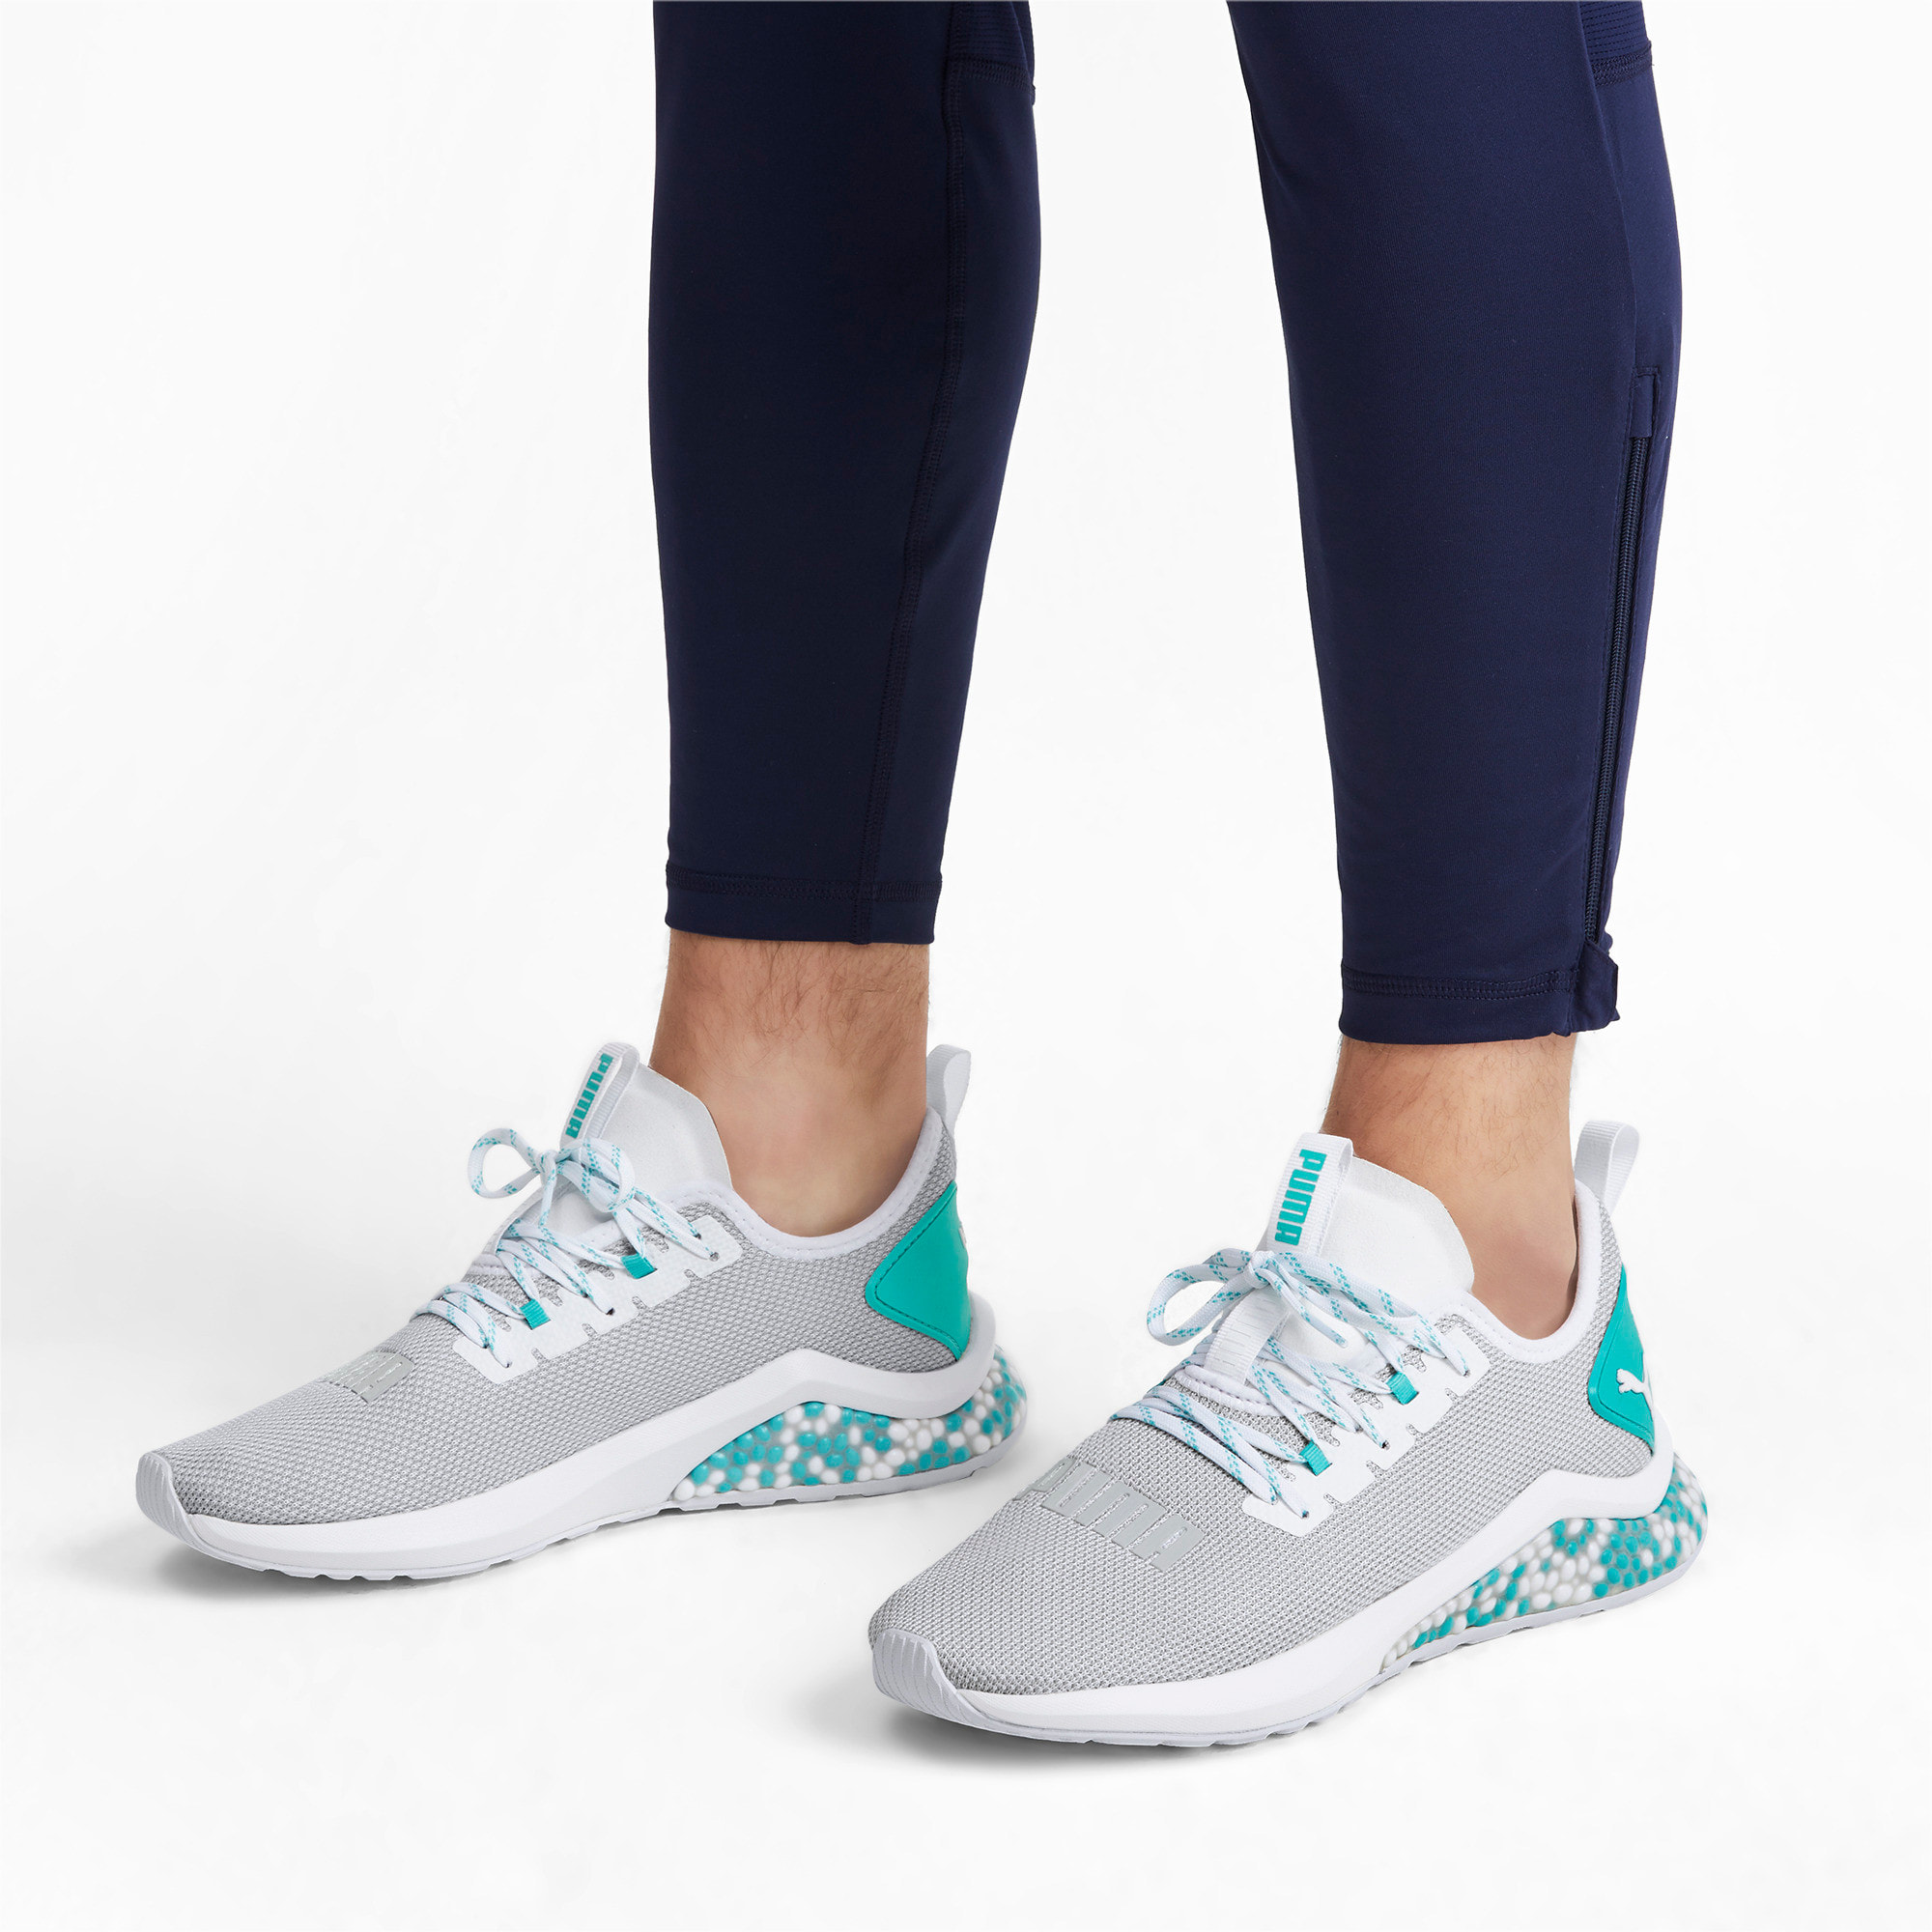 Thumbnail 2 of HYBRID NX Men's Running Shoes, Puma White-Blue Turquoise, medium